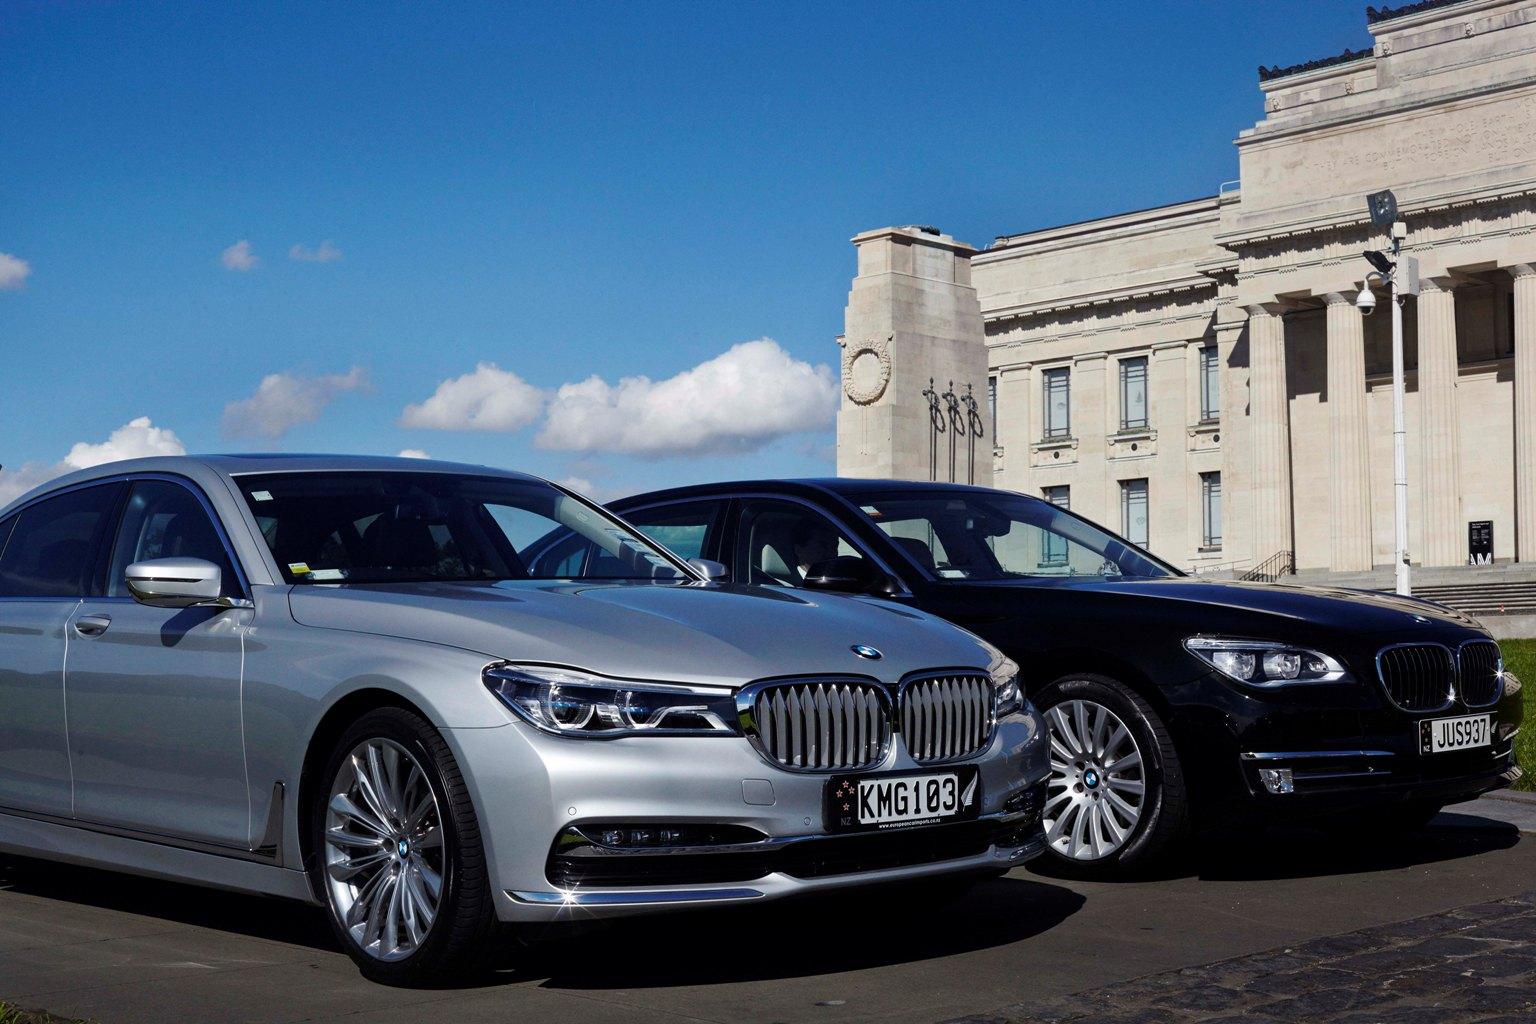 BMW 7 Series VIP Sedan's